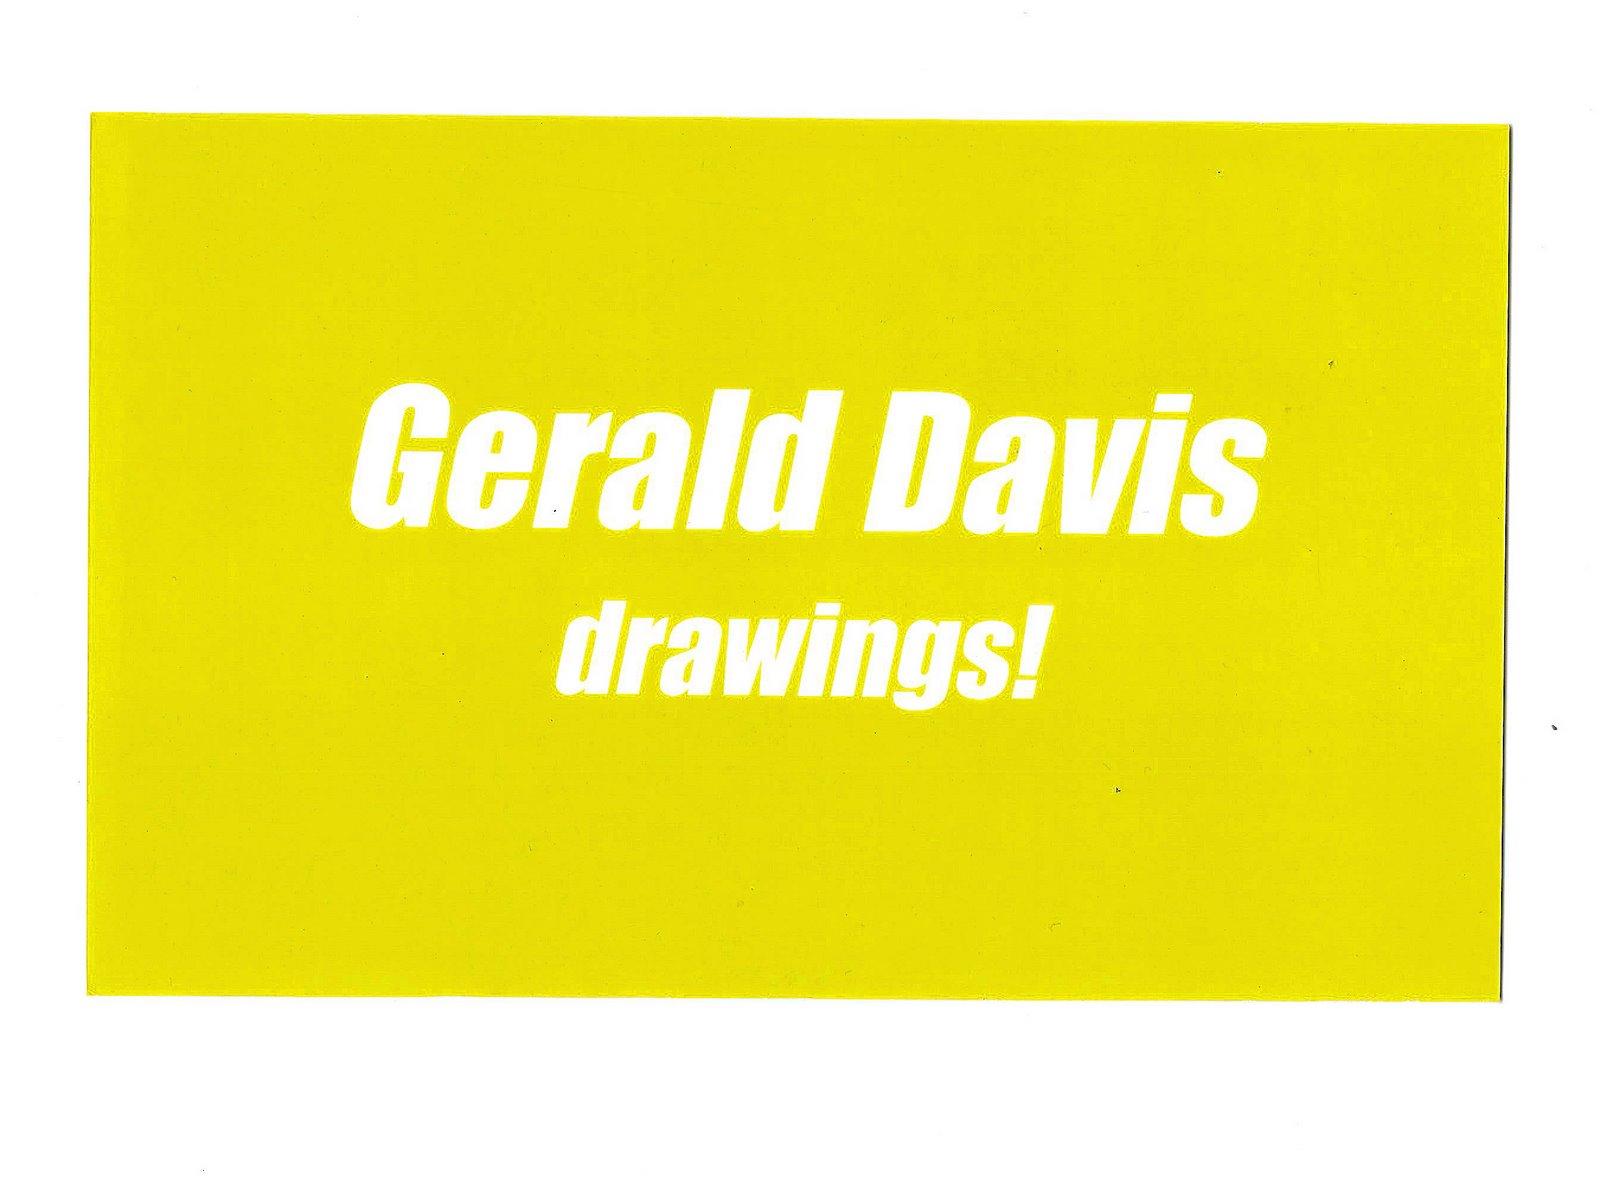 [Gerald+Davis]